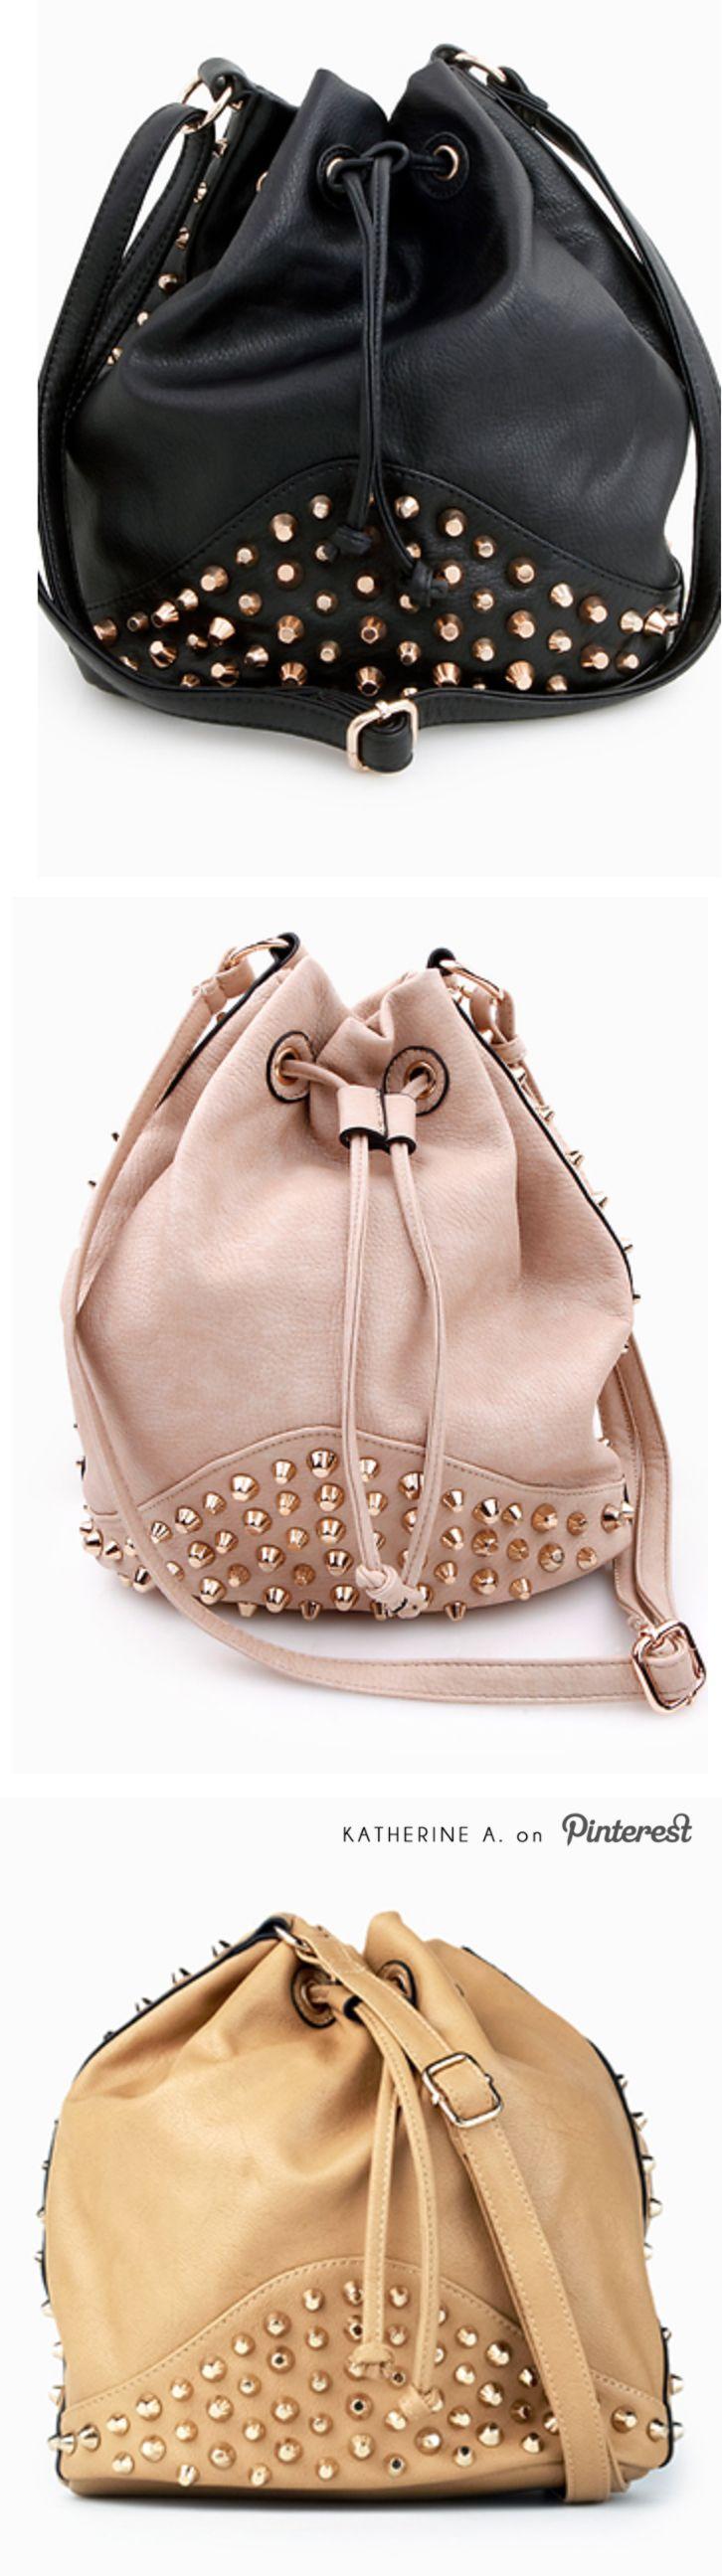 Studded Drawstring Bags / Purses #studded